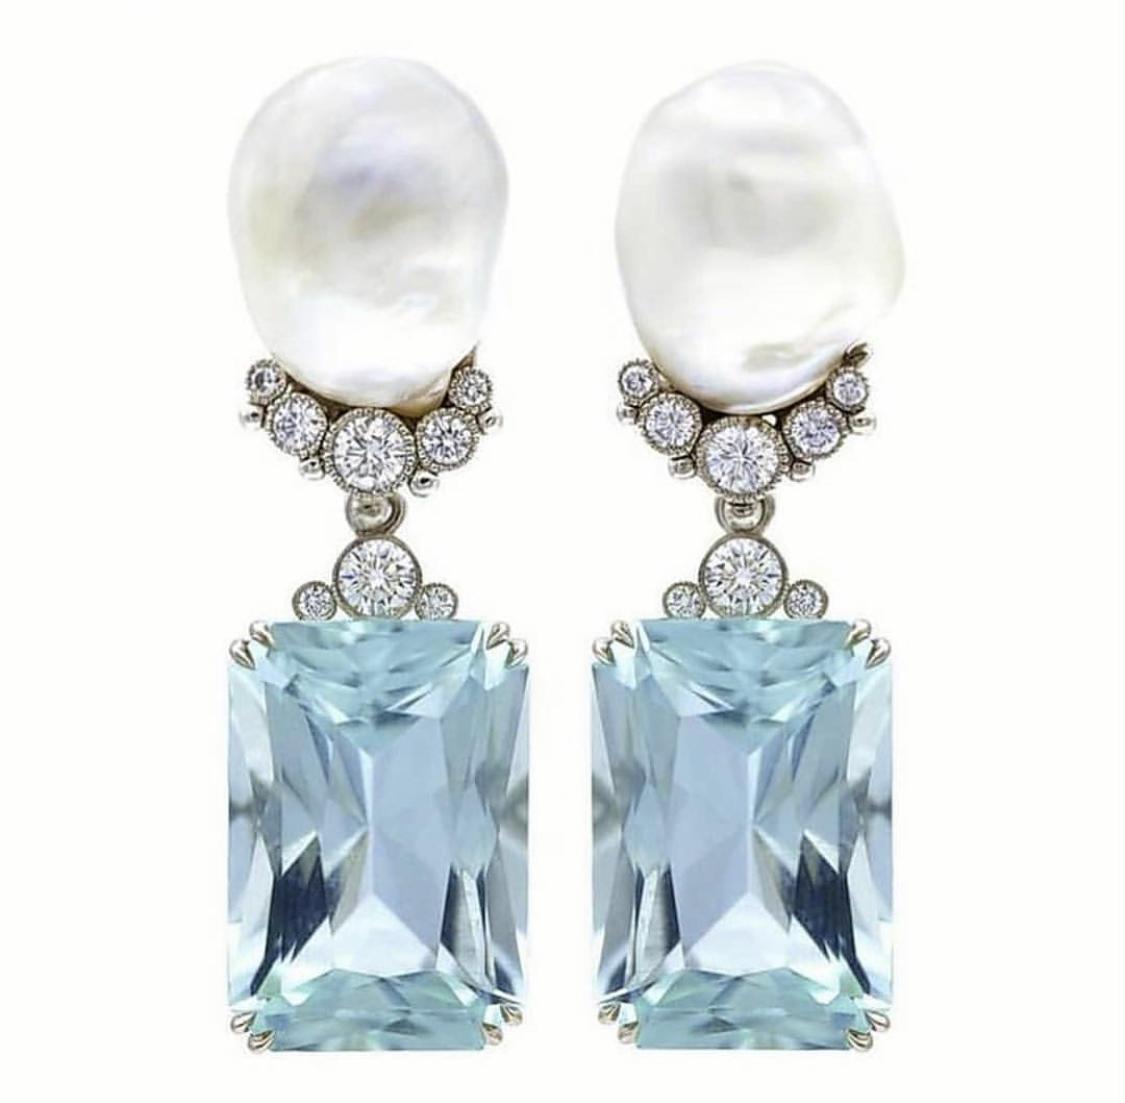 Aquamarine, Peral, Diamonds Earrings by Alex Blal